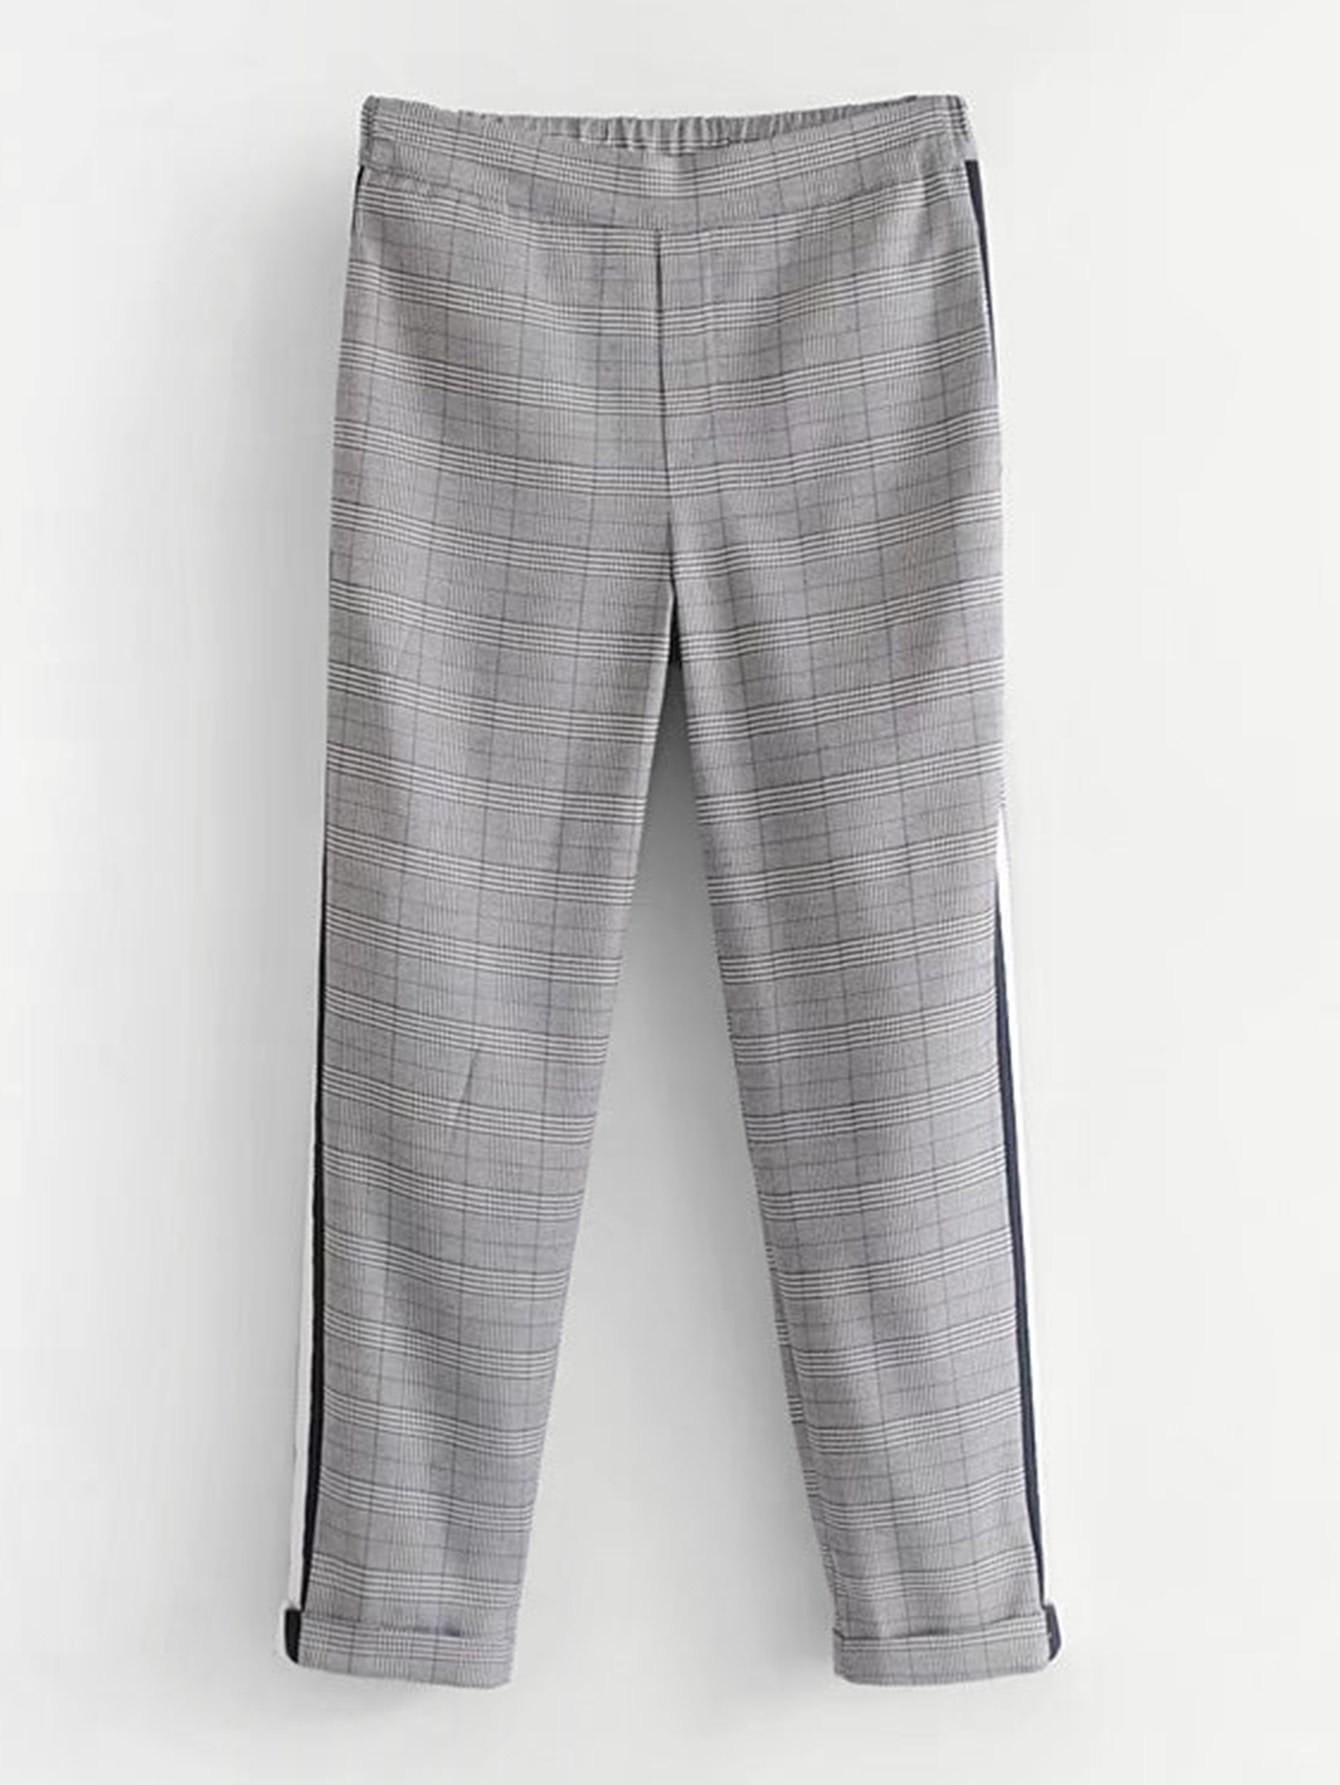 Striped Tape Glen Plaid Pants striped tape side cuffed pants